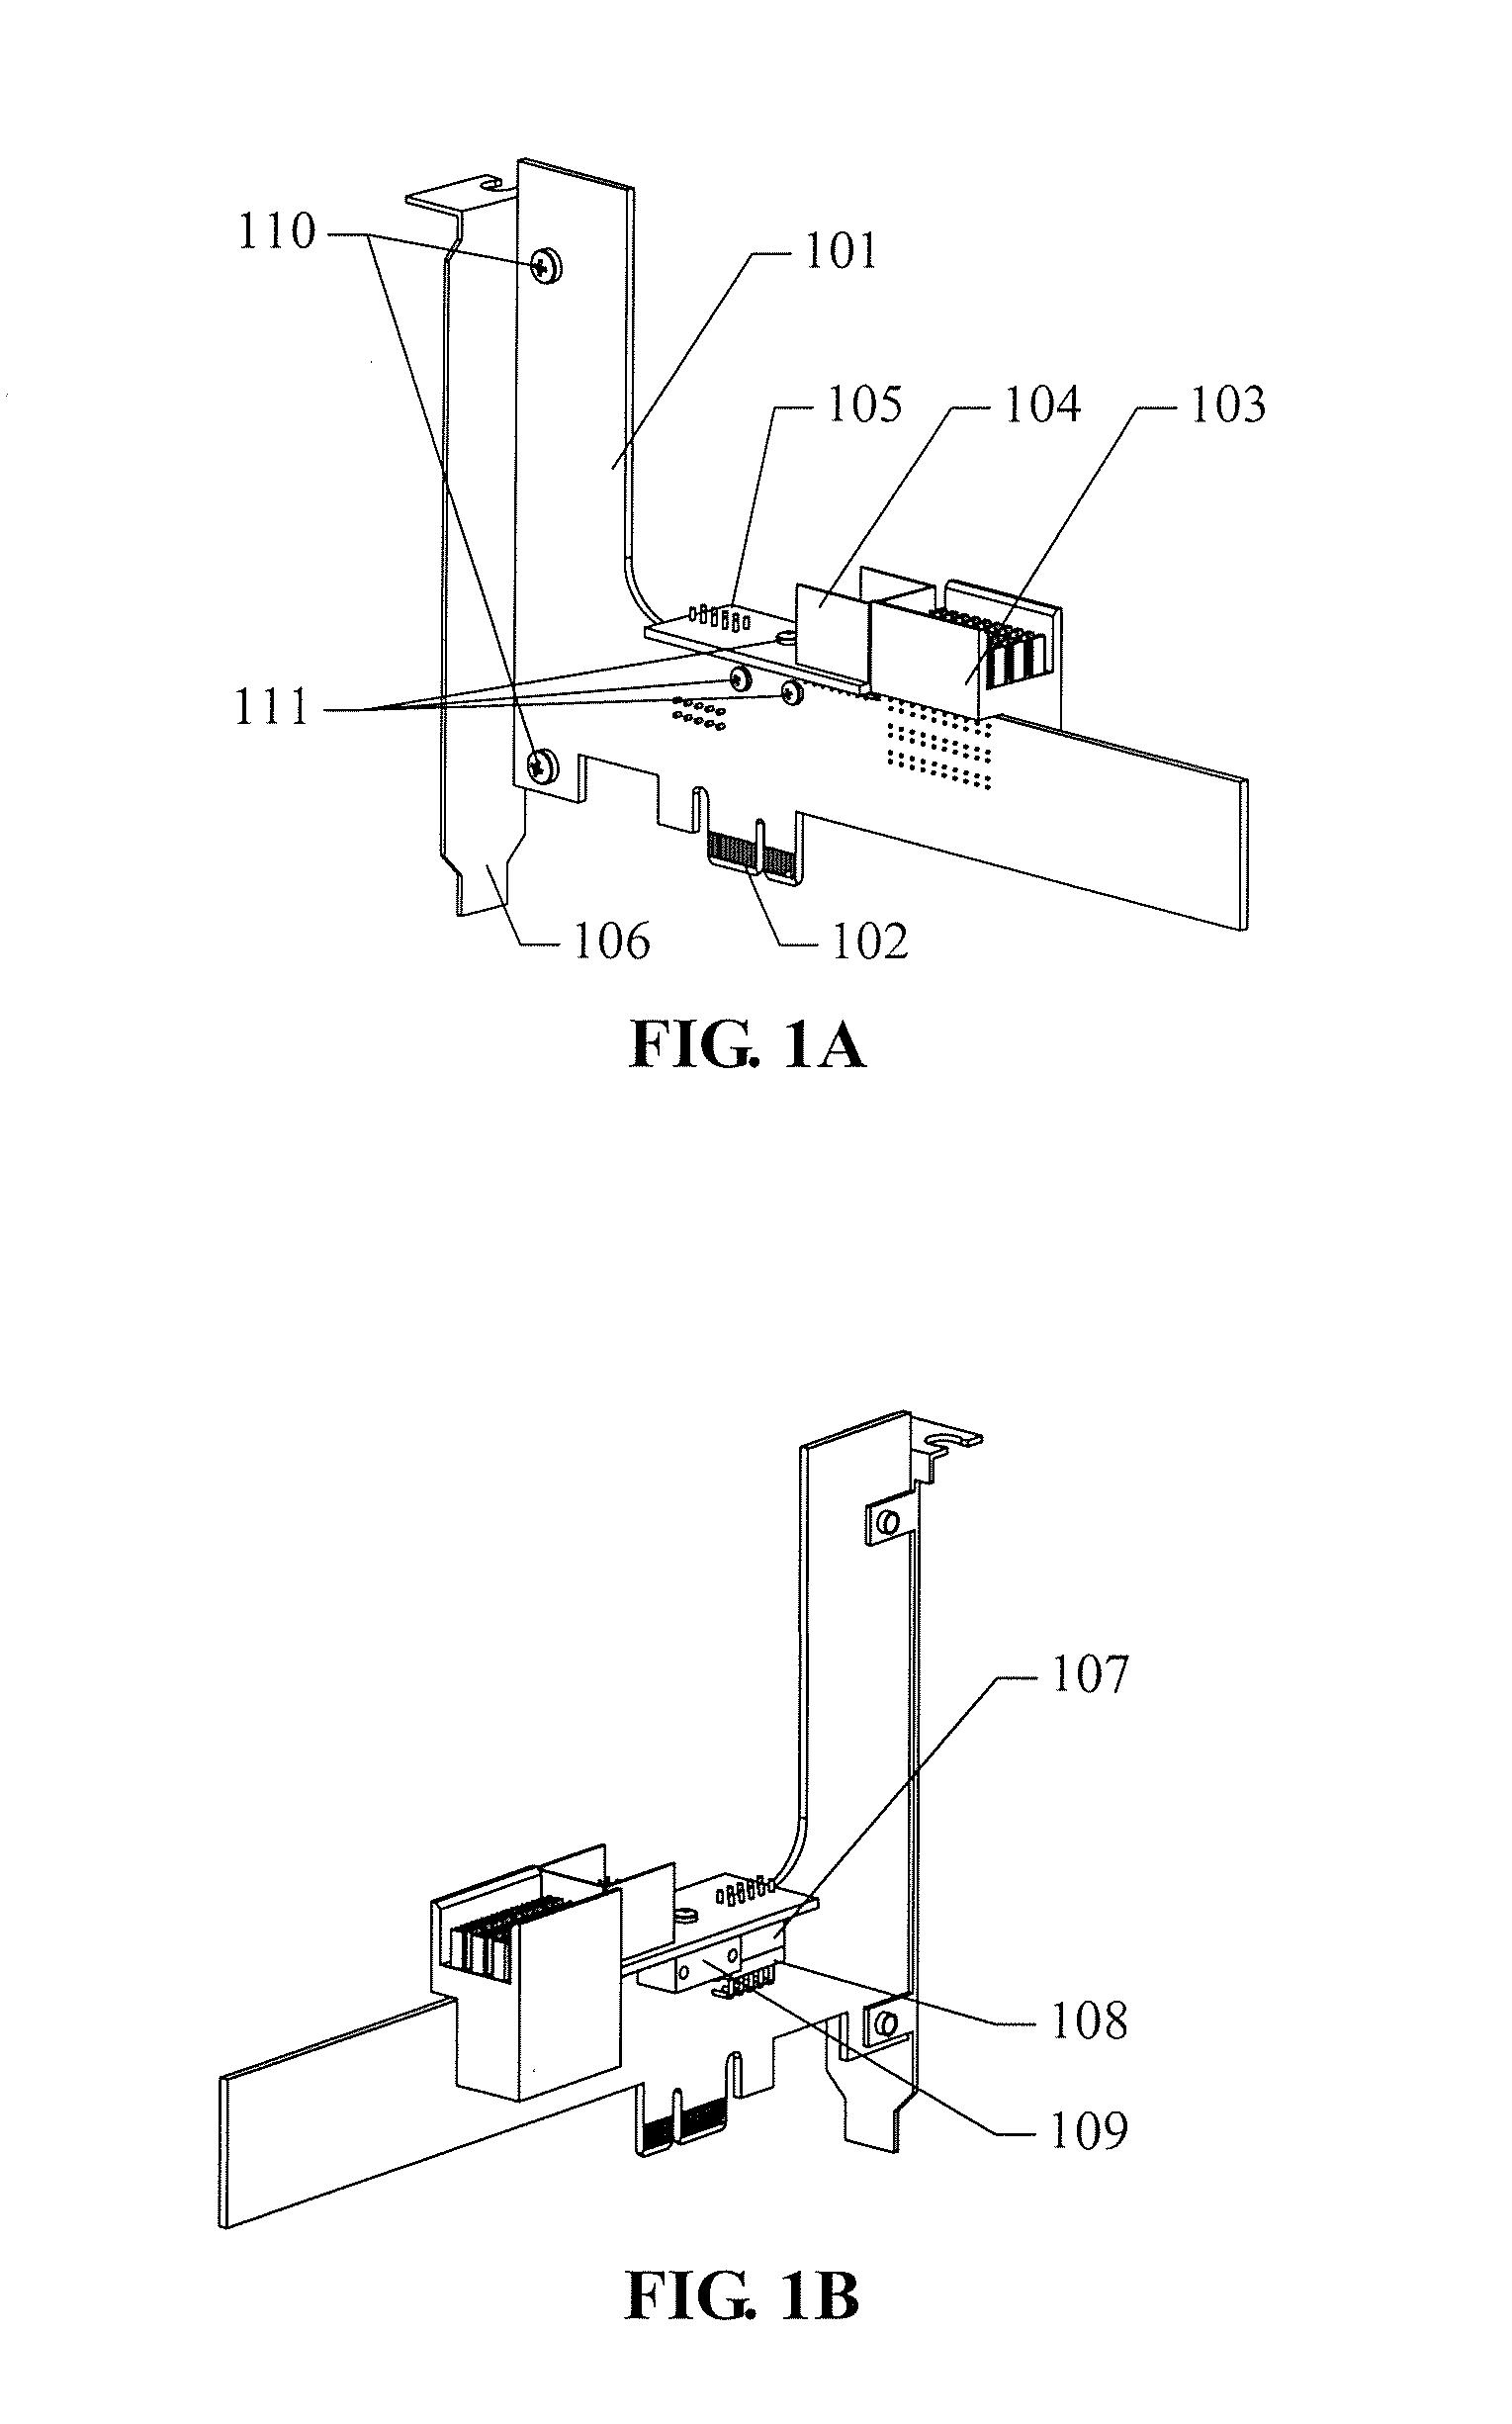 hight resolution of patent drawing 2004 pontiac grand am